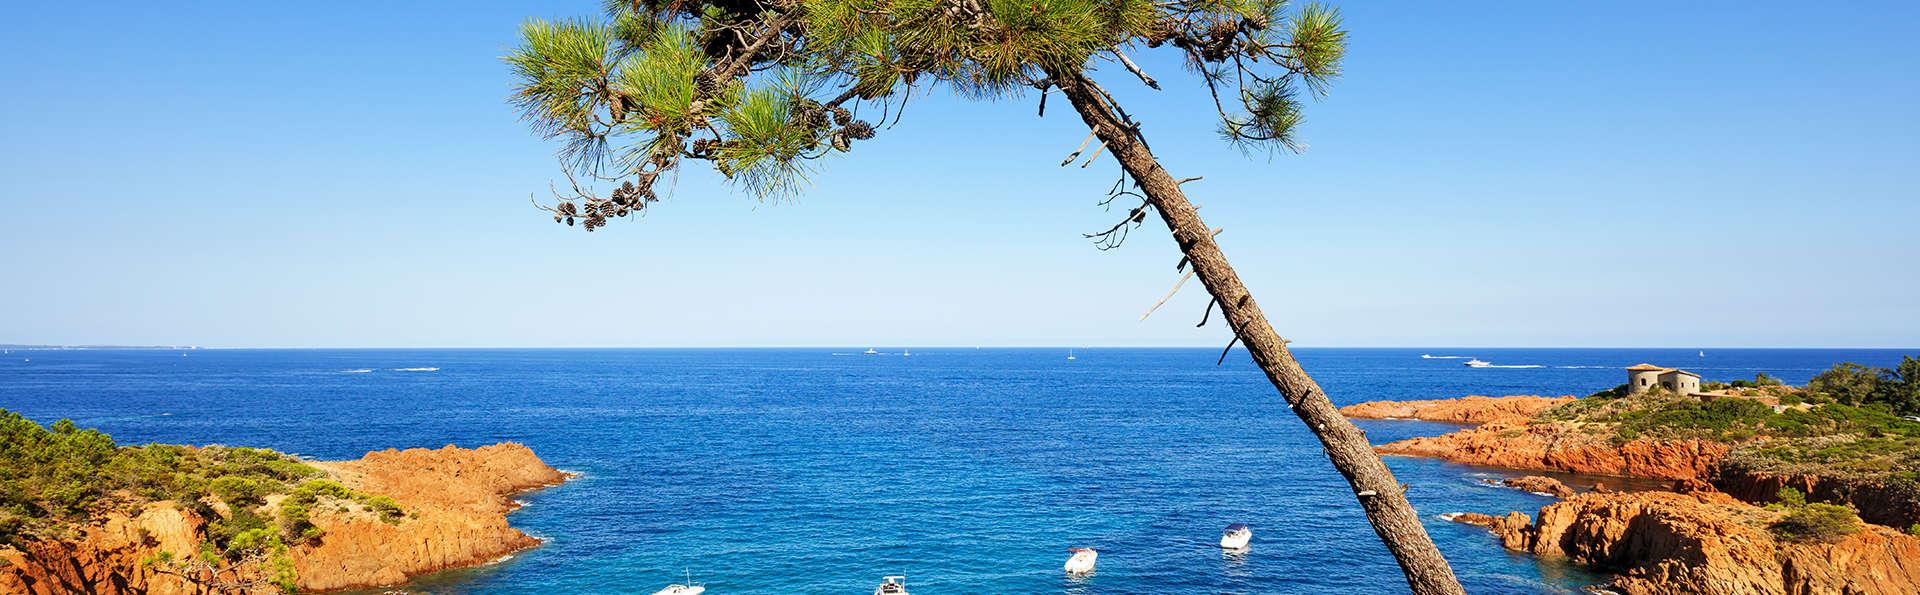 Florella Antibes - EDIT_CANNES_08.jpg